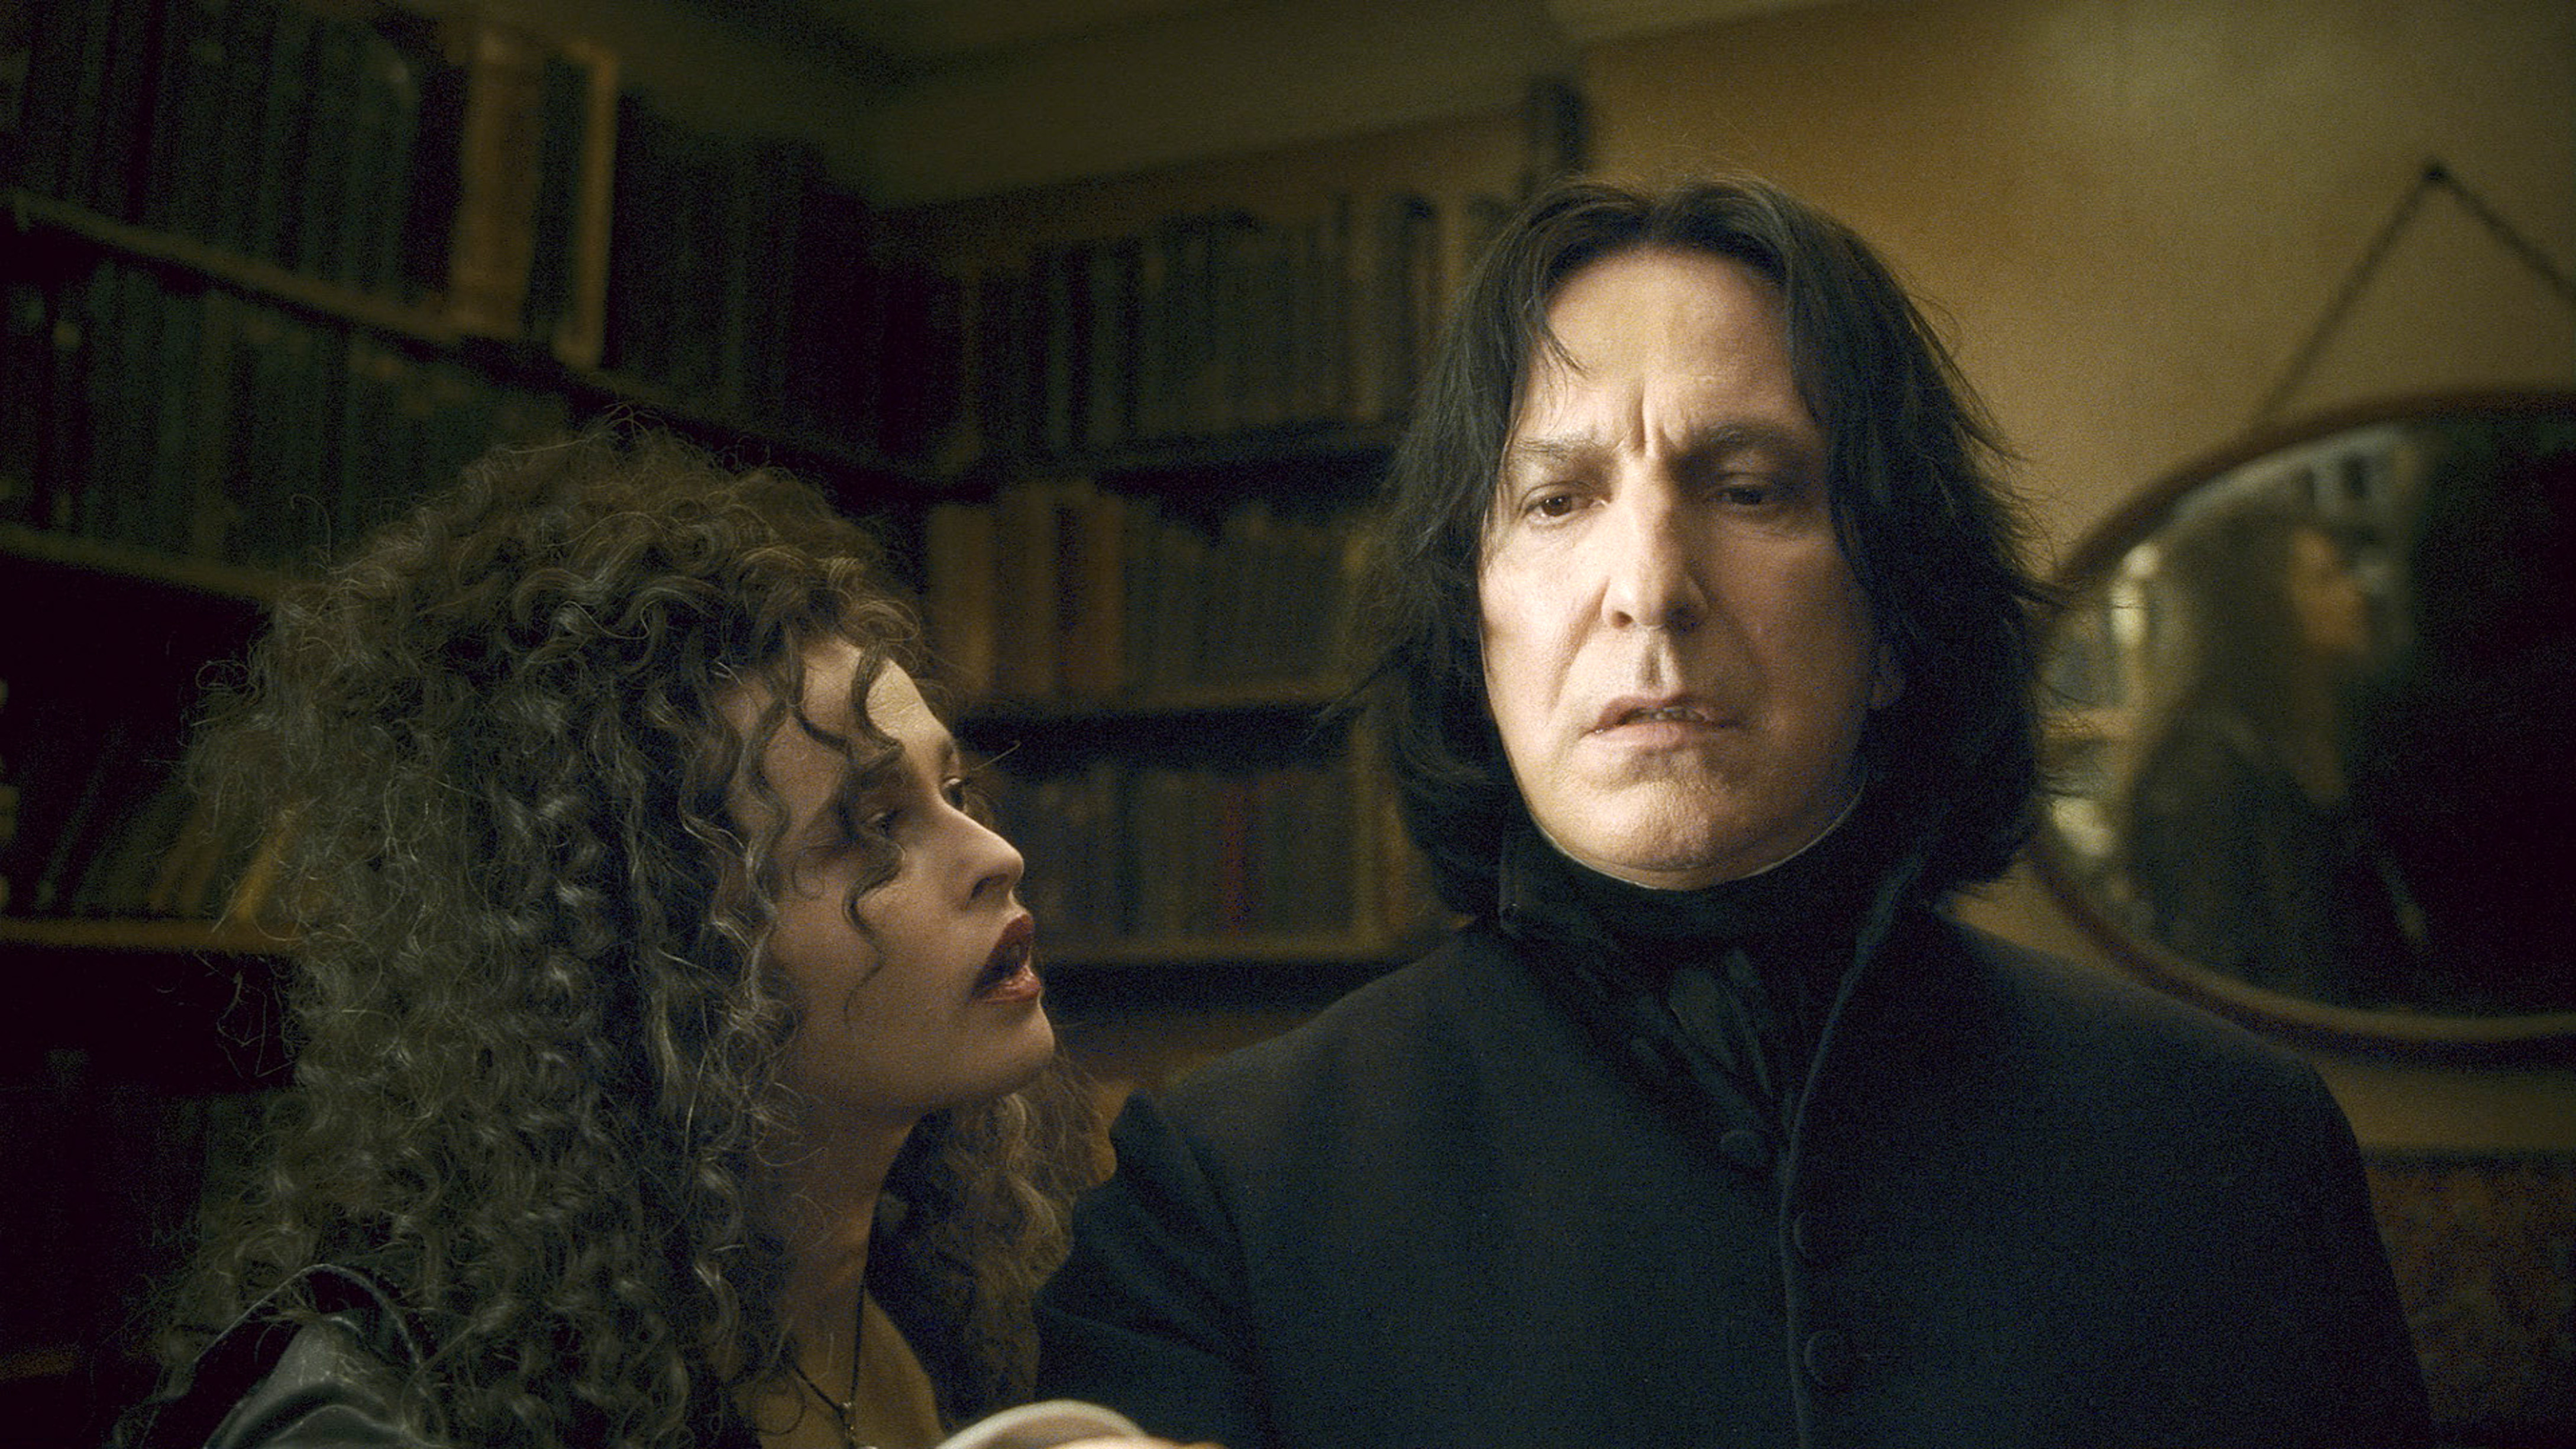 Alan Rickman as Professor Snape in the Harry Potter film series.